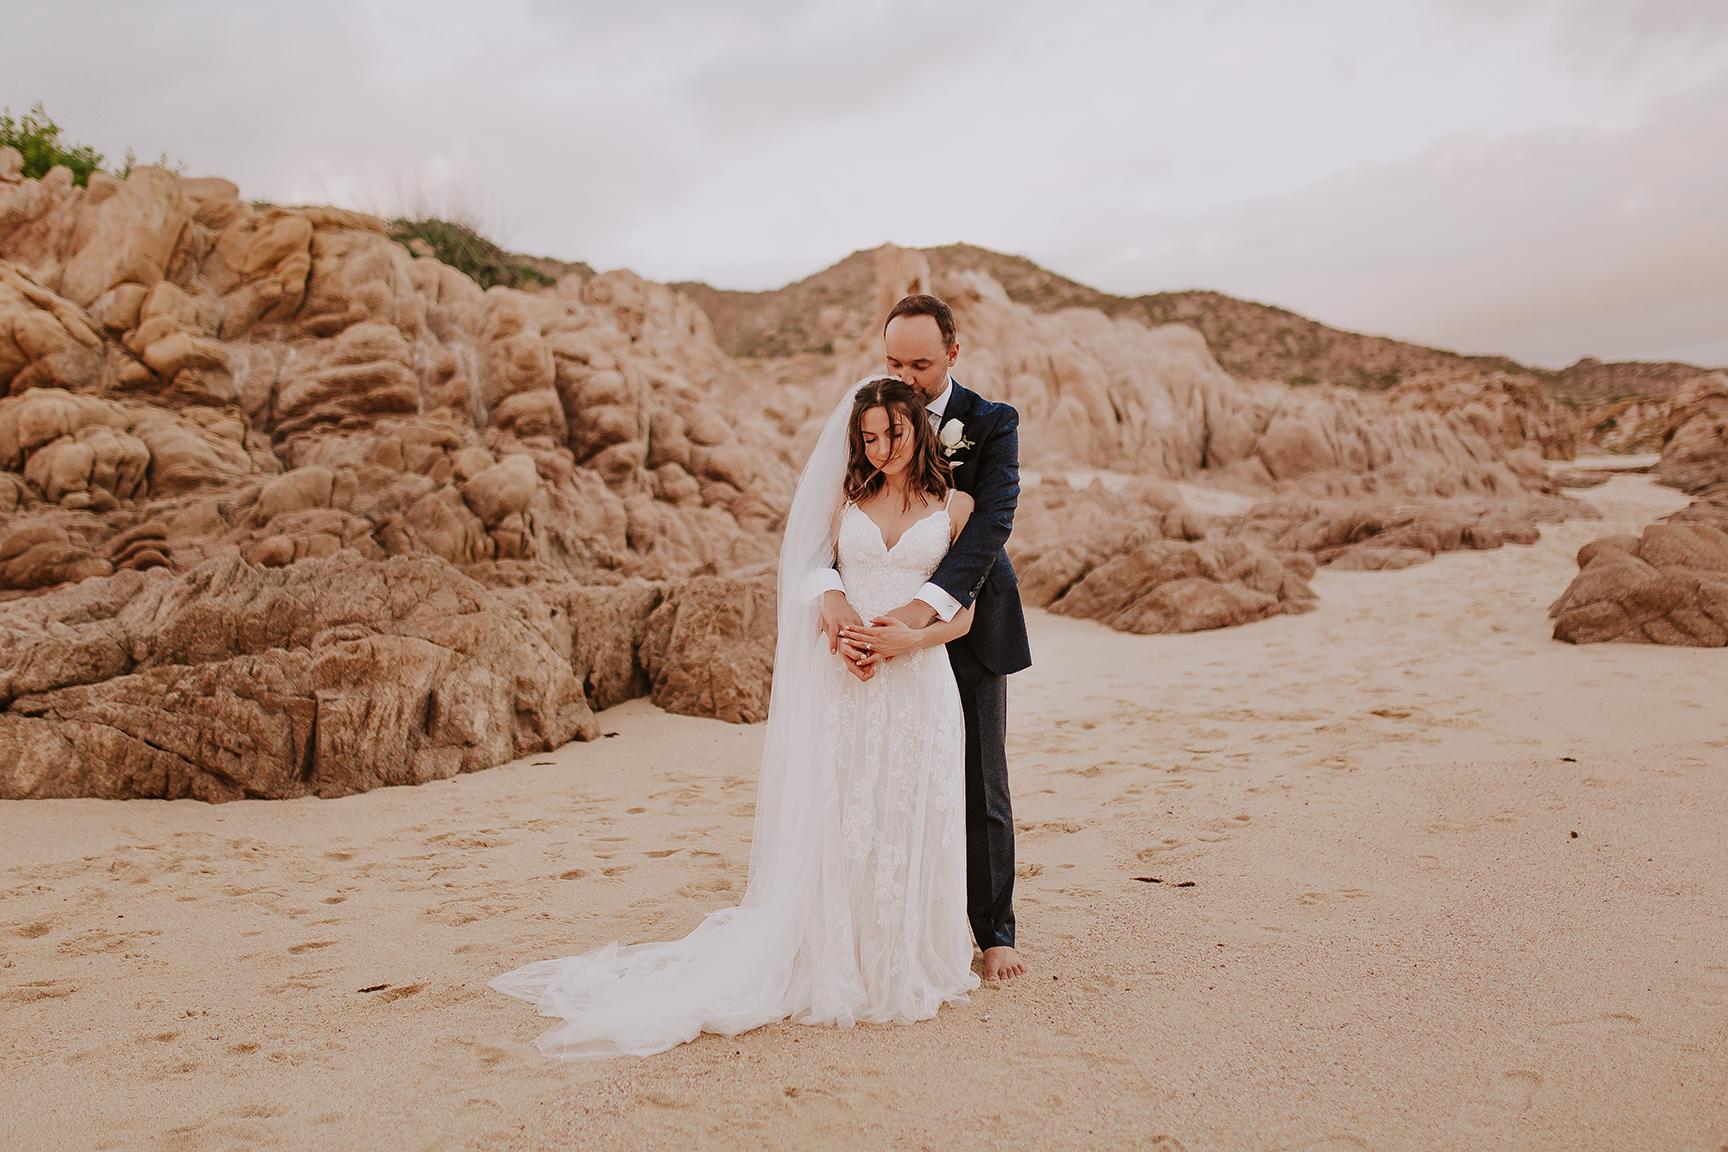 Lindsei+James_cabo_wedding_810.jpg